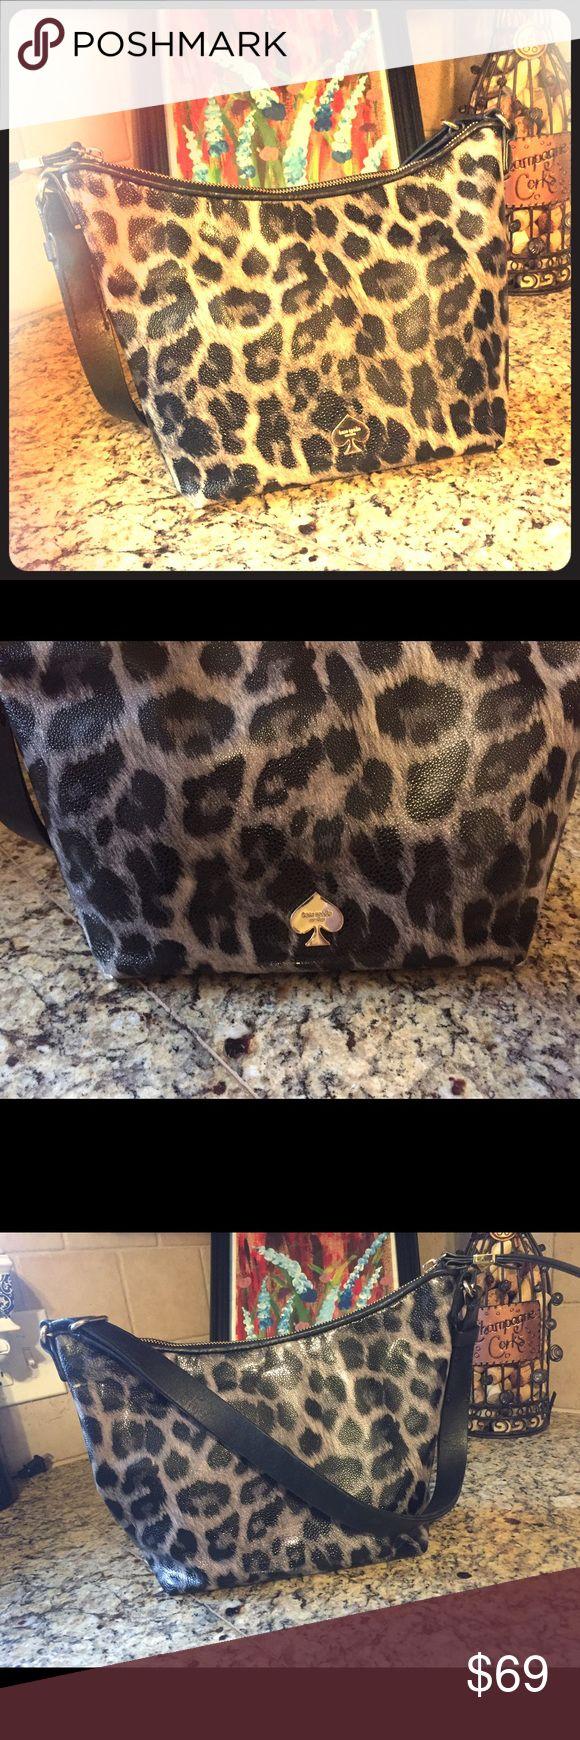 Kate Spade Animal Print Handbag Kate Spade Handbag. A little wear & tear, but overall still looks great! kate spade Bags Satchels